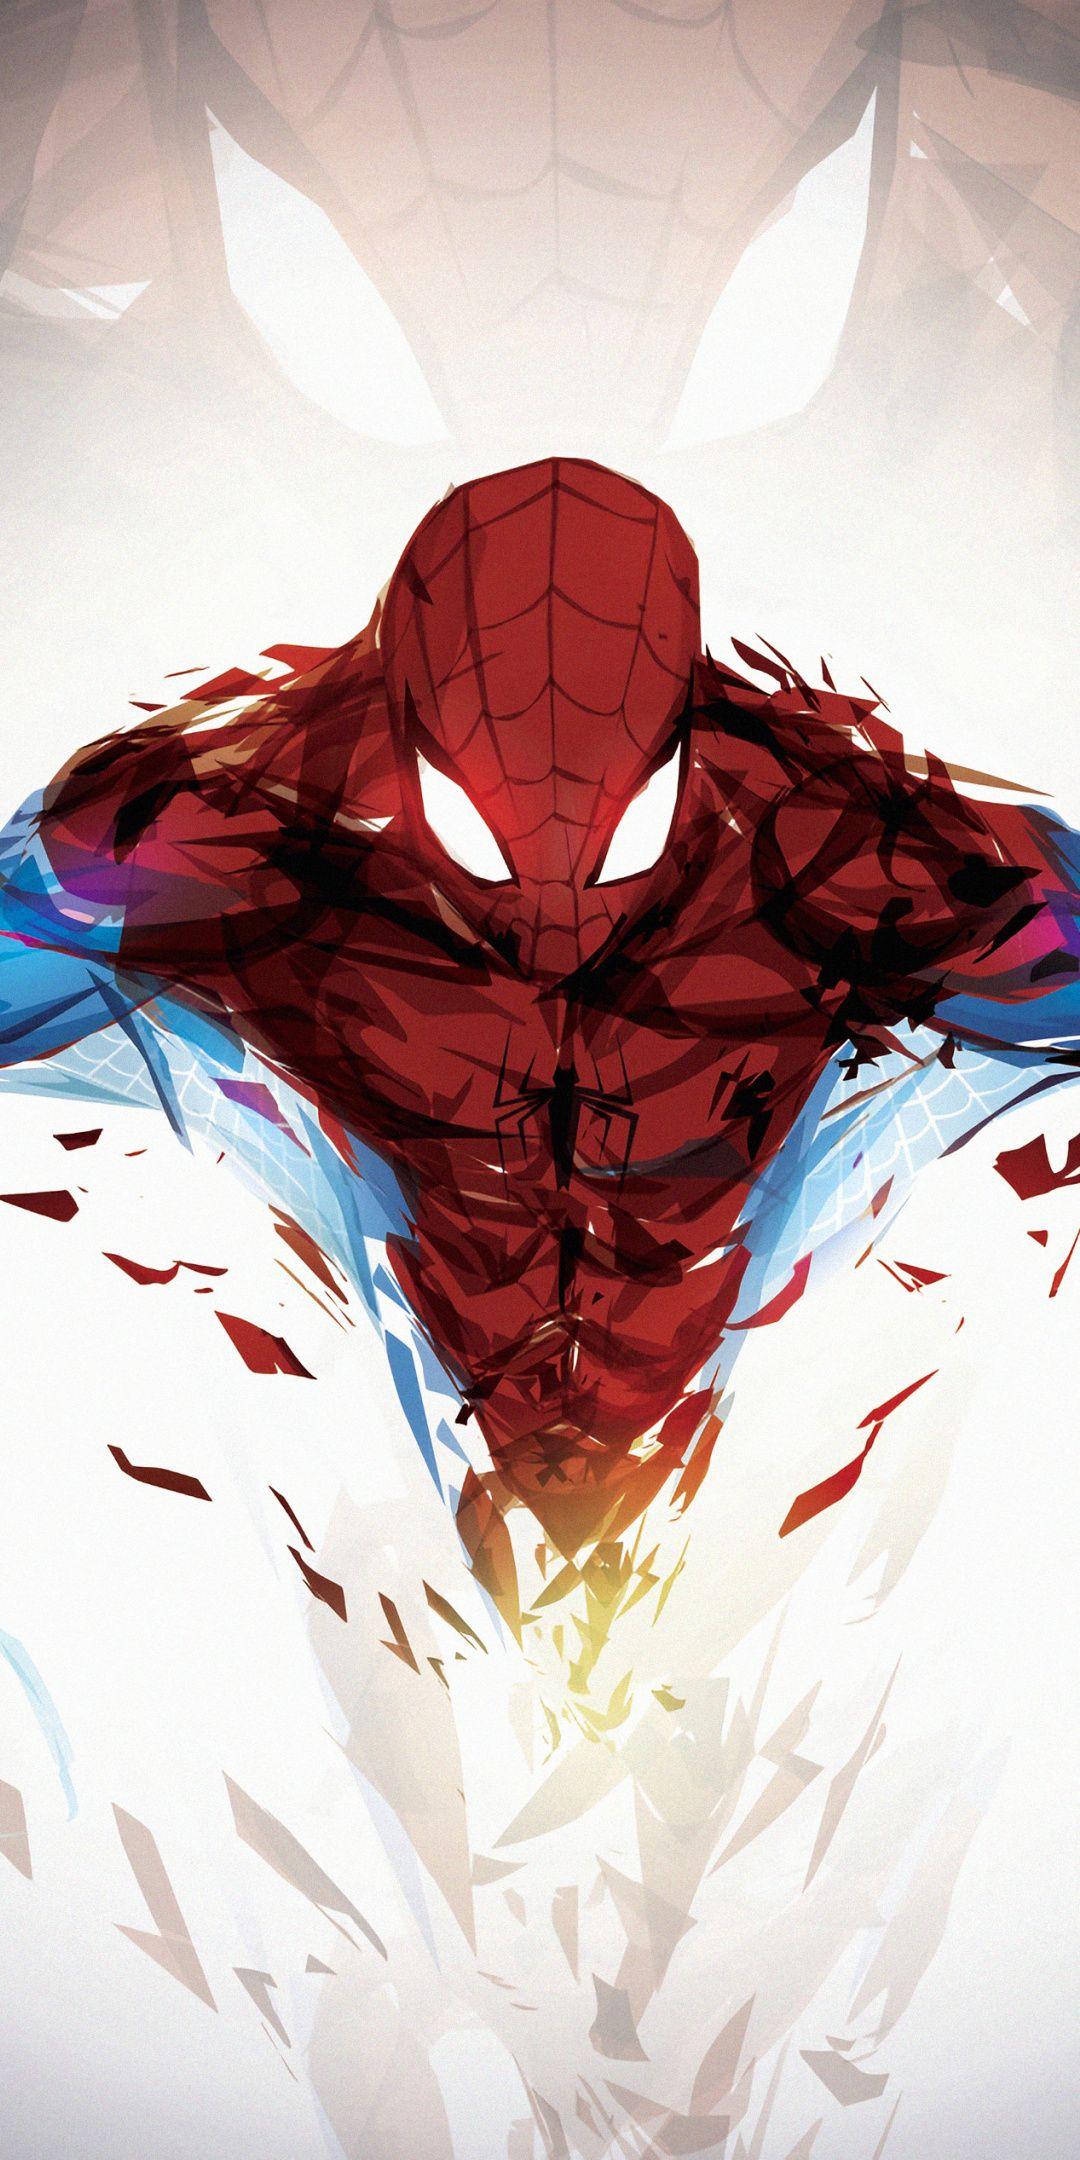 1080x2160 Shattered art, spiderman, superhero, 2019